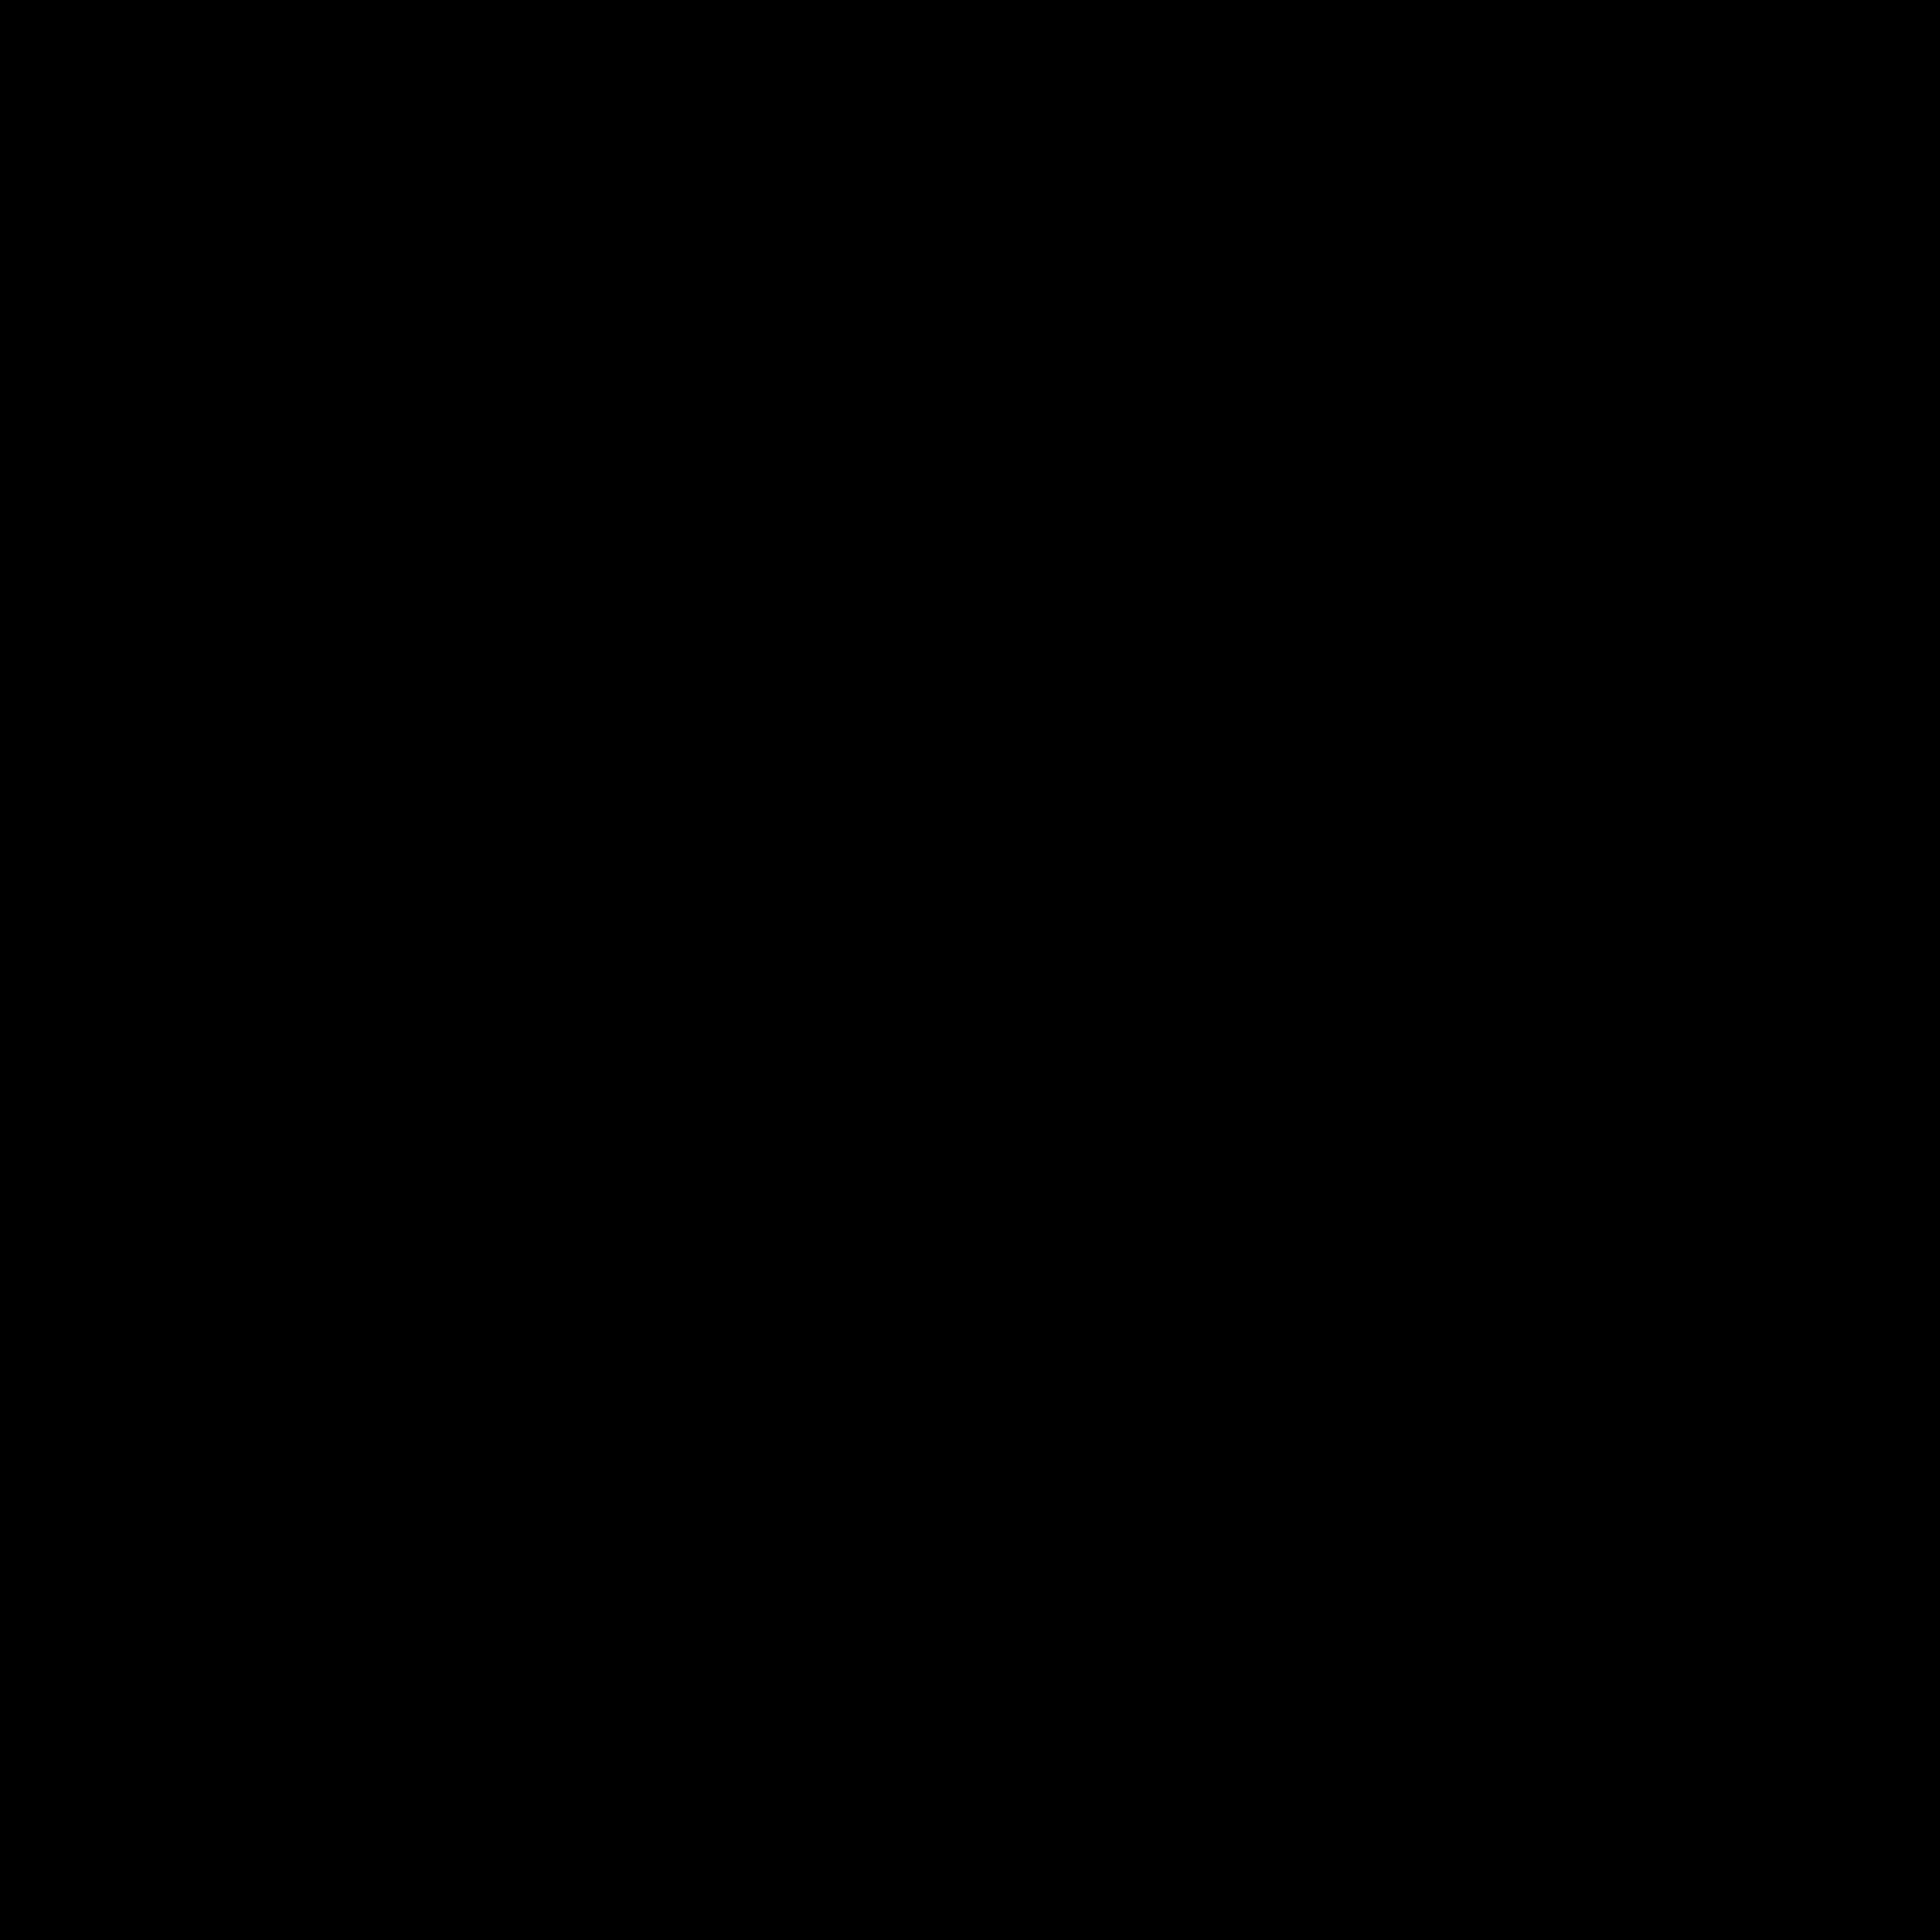 51-Parallel_51-Parallel-Media-Black.png